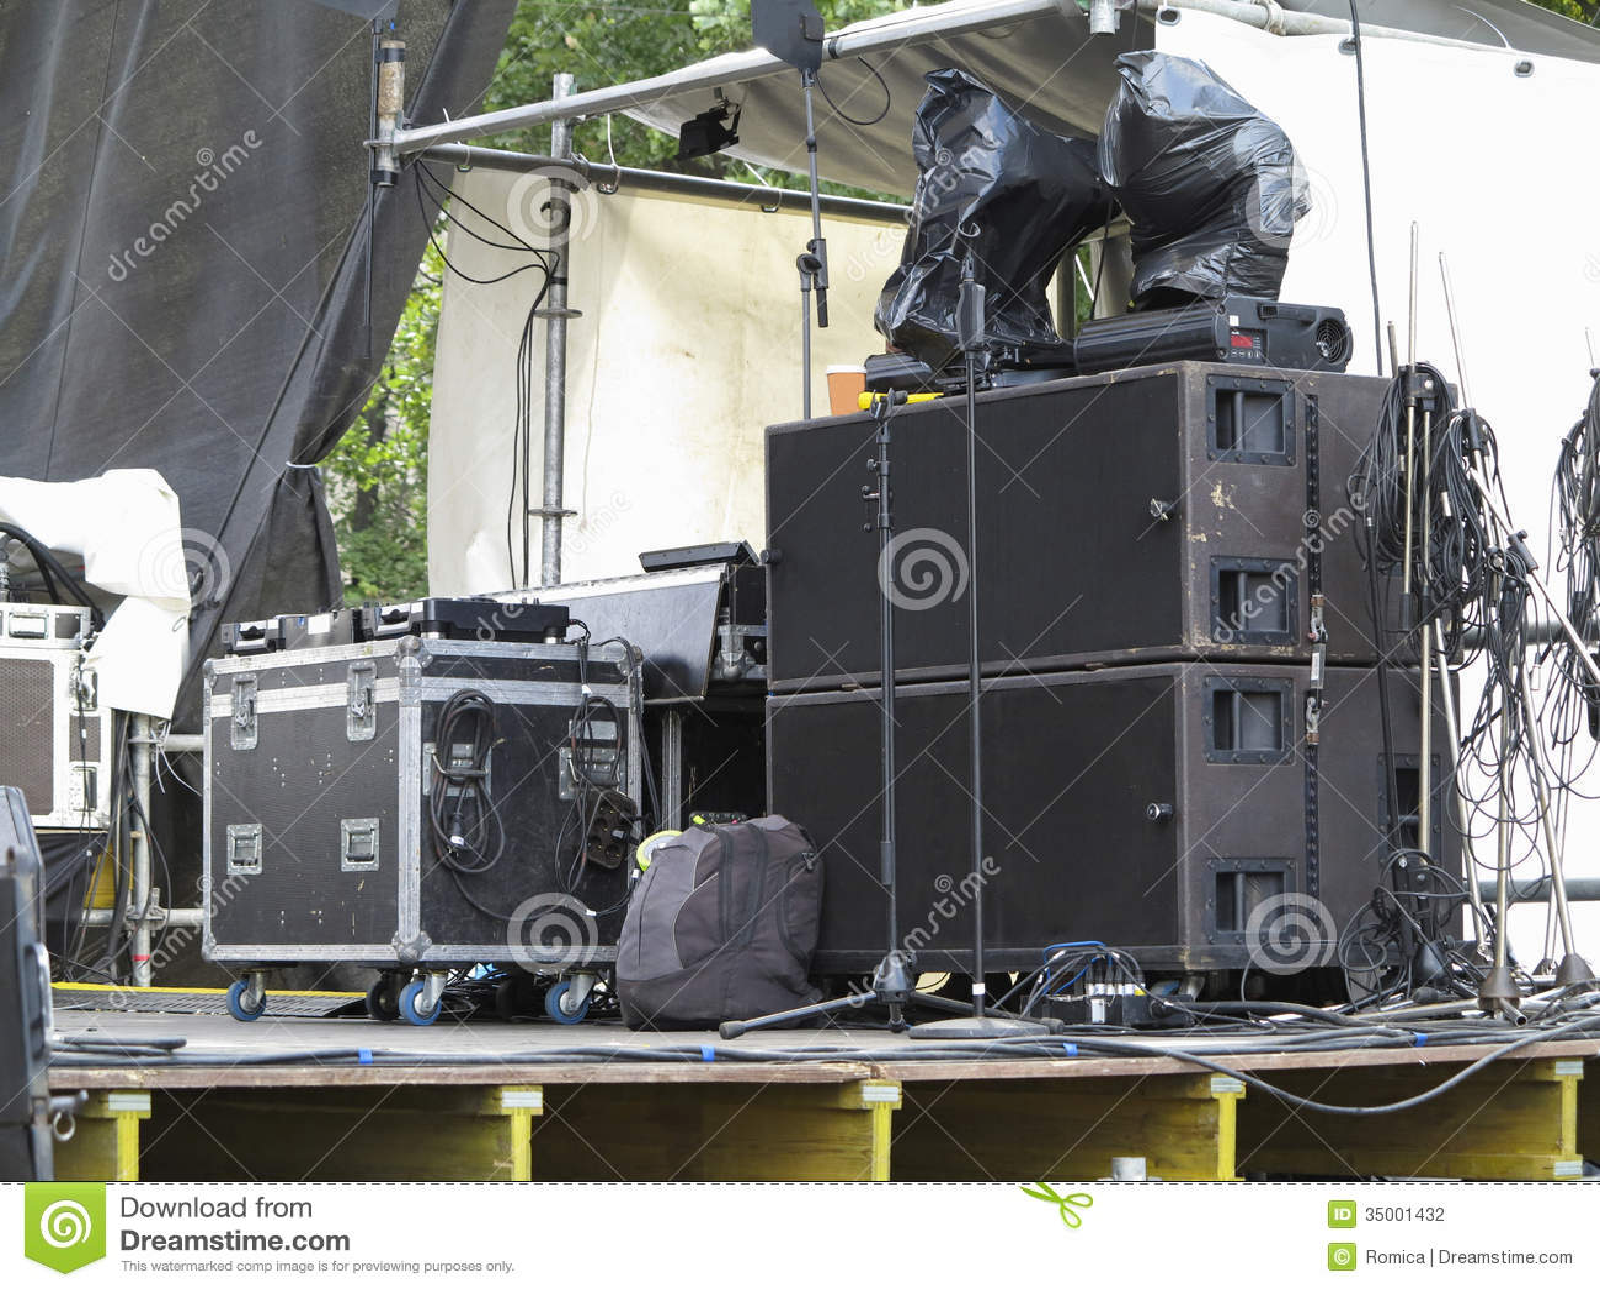 Powerfull Concerto Audio Speakers amplifiers spotlights